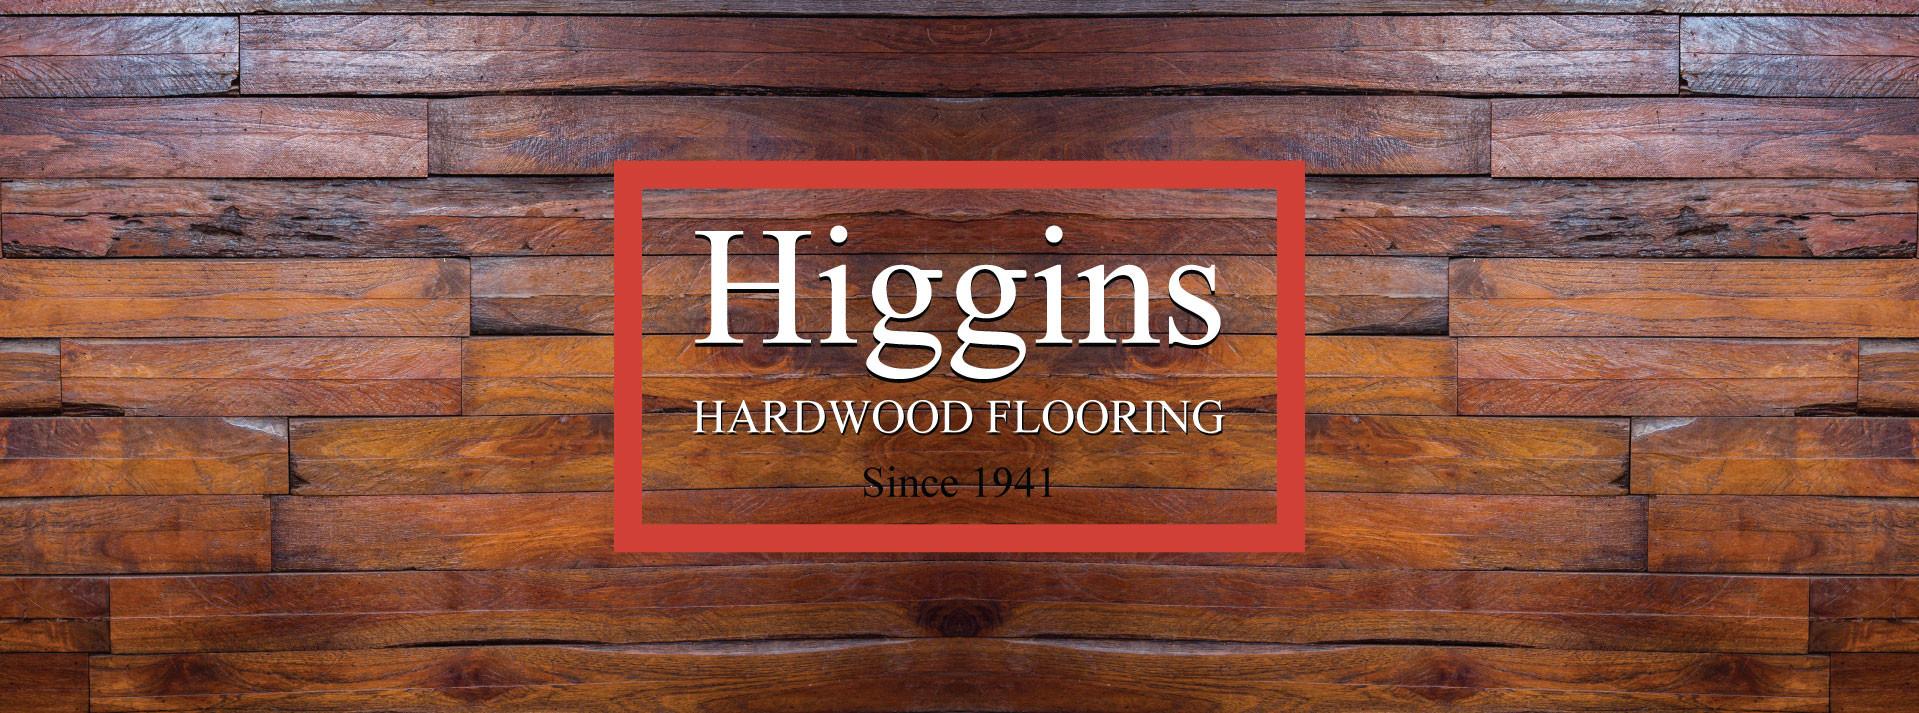 hardwood flooring toronto installation price of higgins hardwood flooring in peterborough oshawa lindsay ajax inside office hours